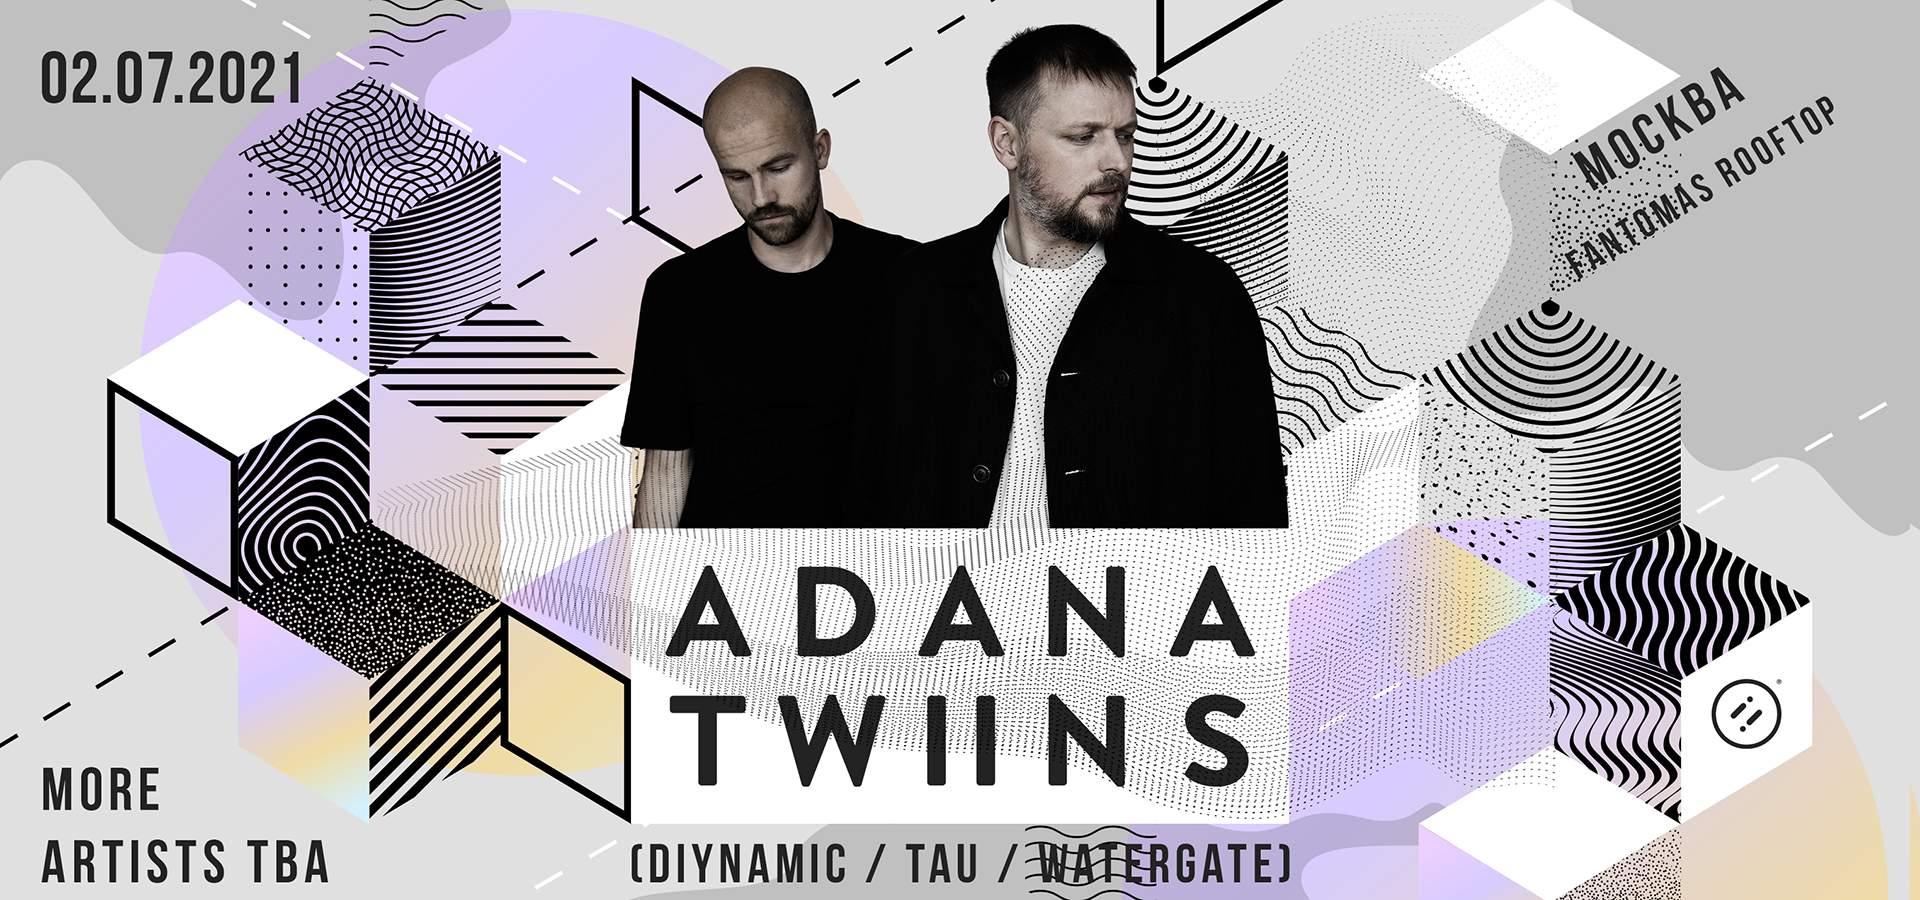 Adana Twins Fantomas